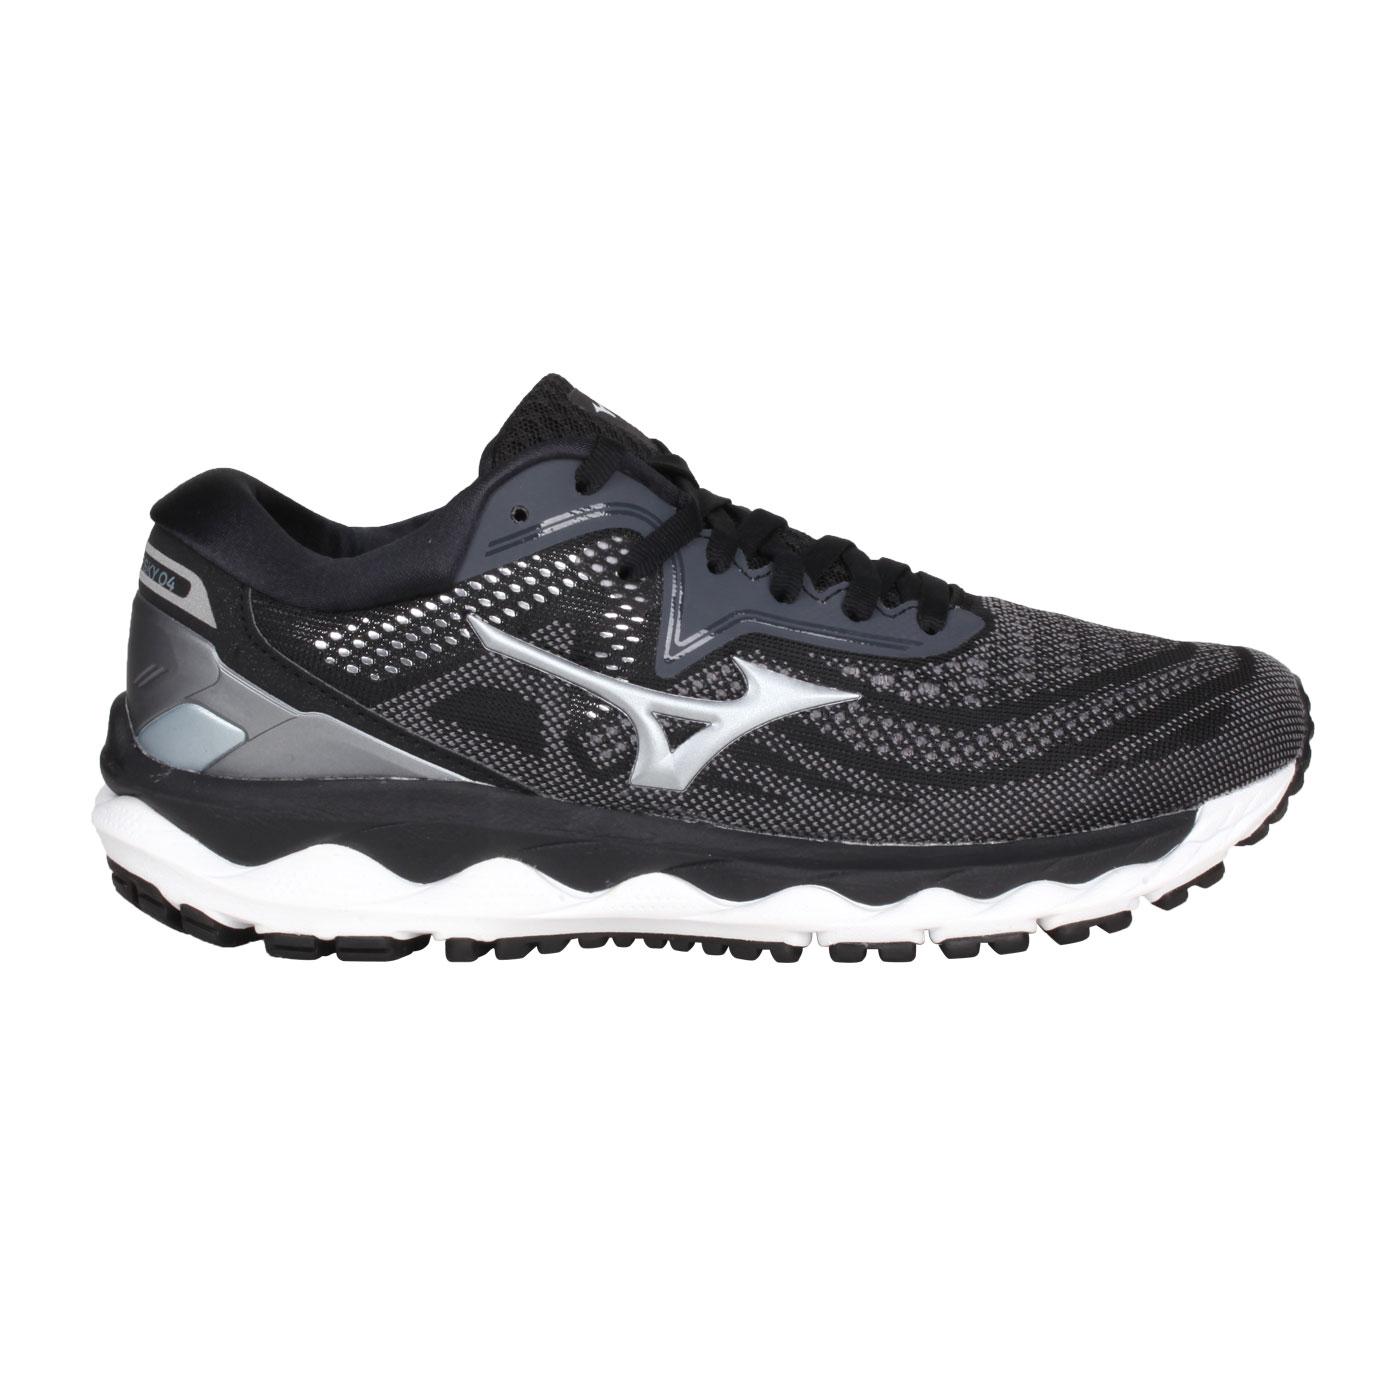 MIZUNO 女款慢跑鞋  @WAVE SKY 4@J1GD200234 - 黑灰銀